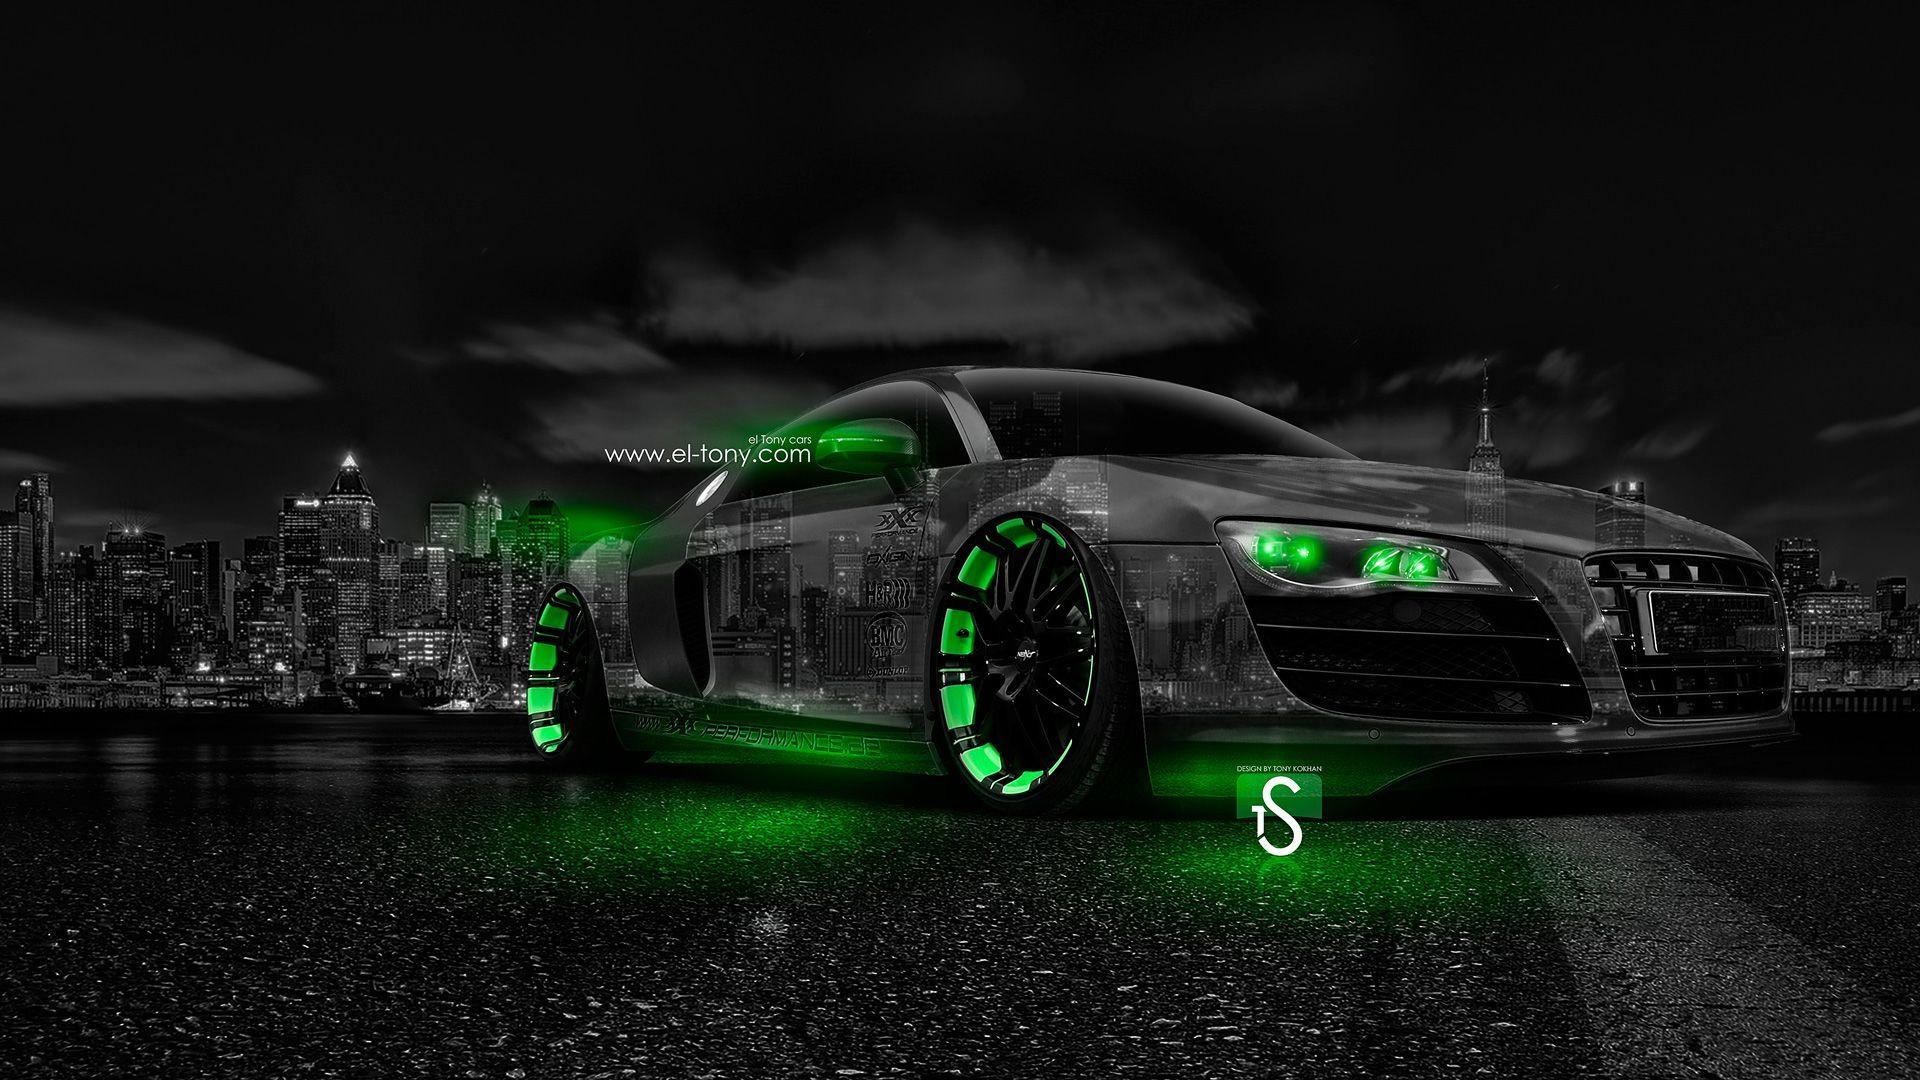 42++ Green Audi R8 Wallpaper 1600x 900 free download